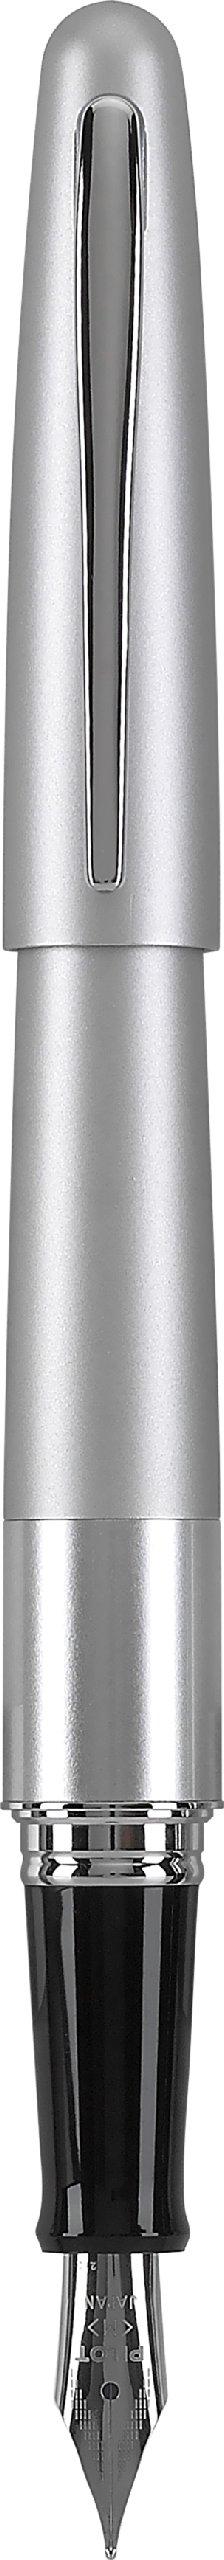 Pilot Metropolitan Collection Fountain Pen, Silver Barrel, Classic Design, Fine Nib, Black Ink (91113)